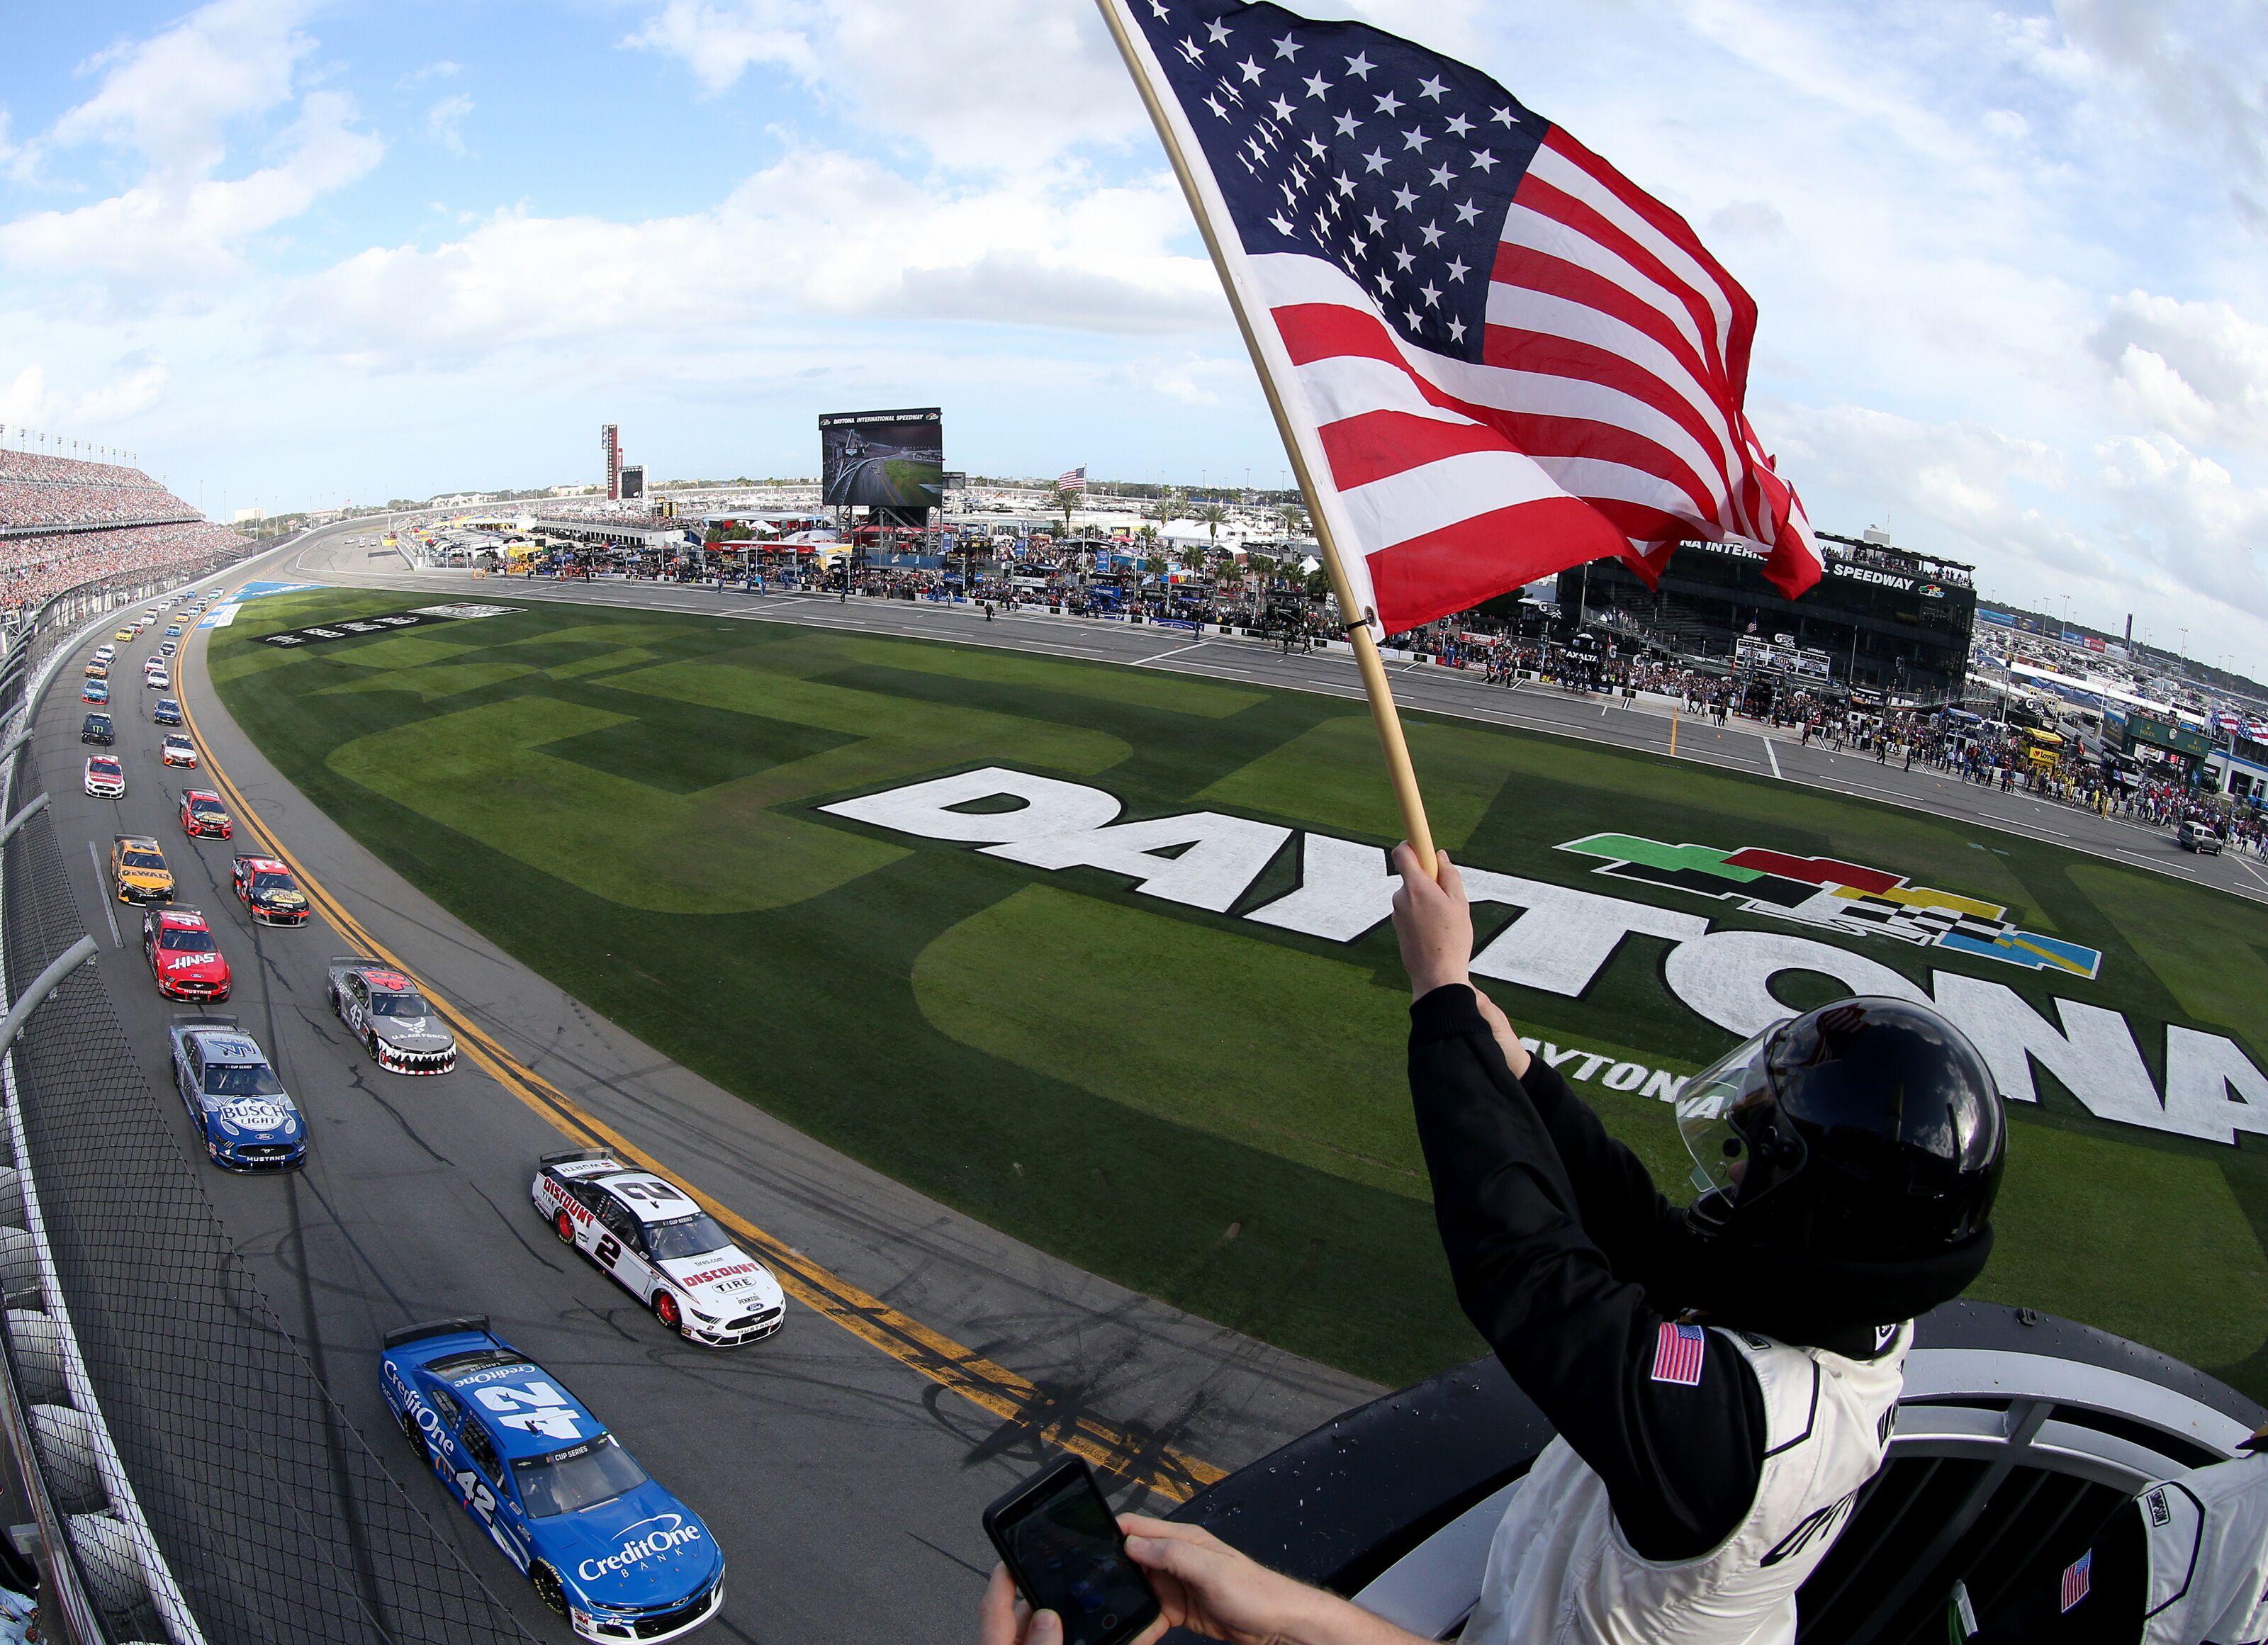 NASCAR: Daytona 500 postponed to Monday after 20 laps